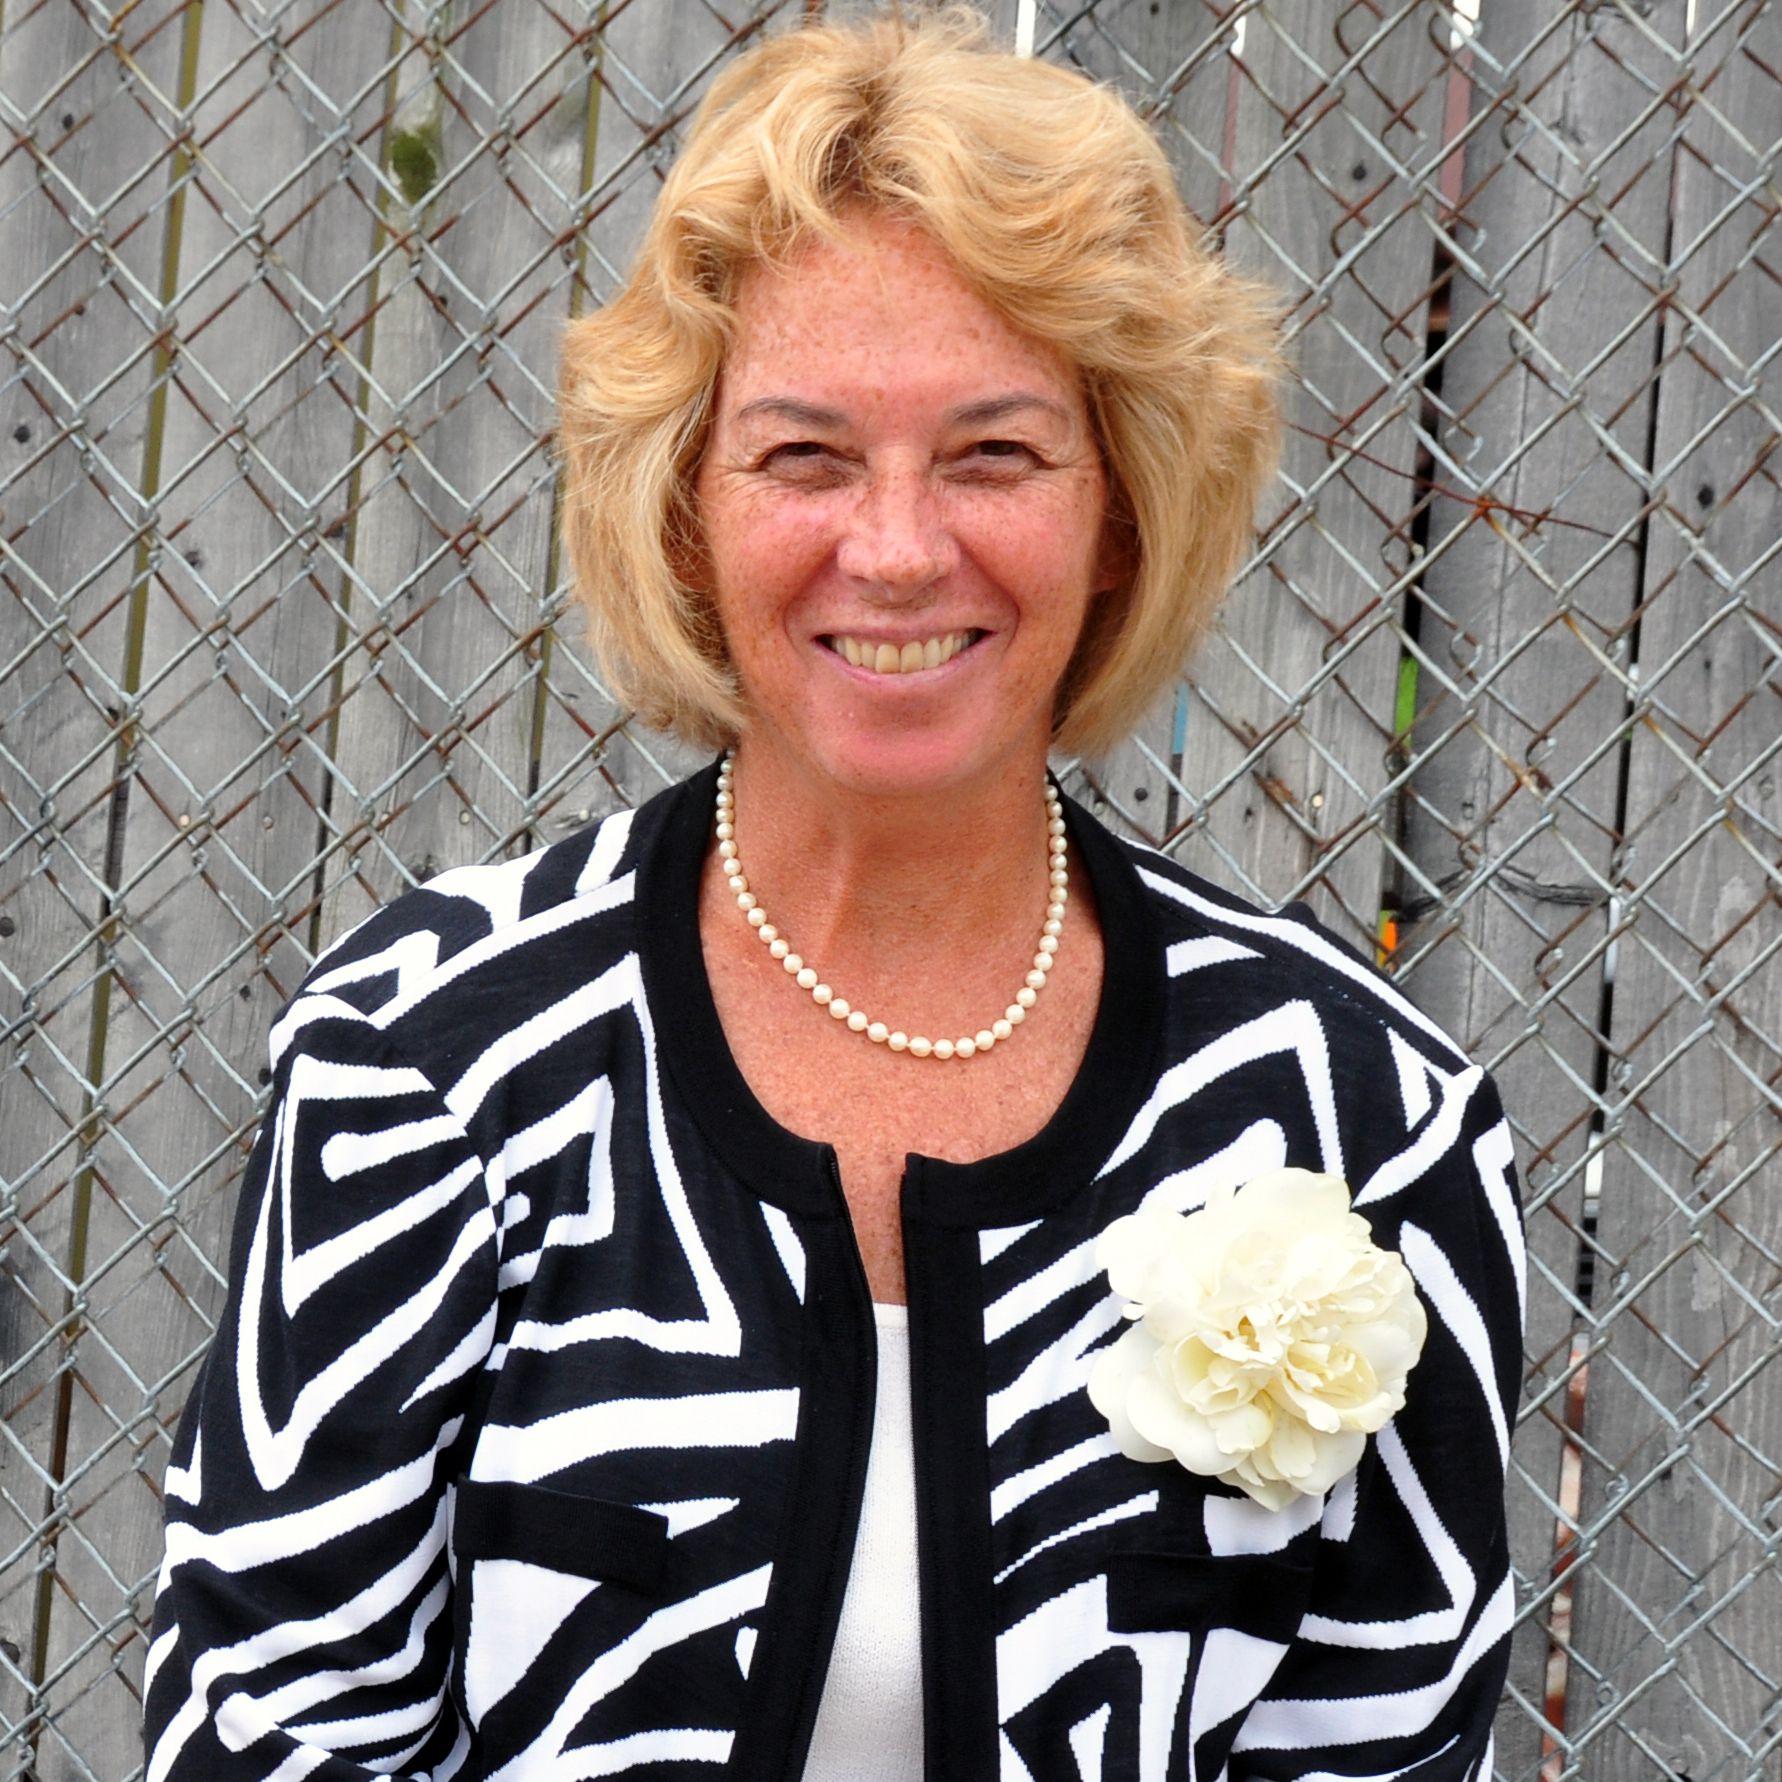 Kathleen Brown, practice associate professor in Penn's School of Nursing, will be Patel's mentor for the year.